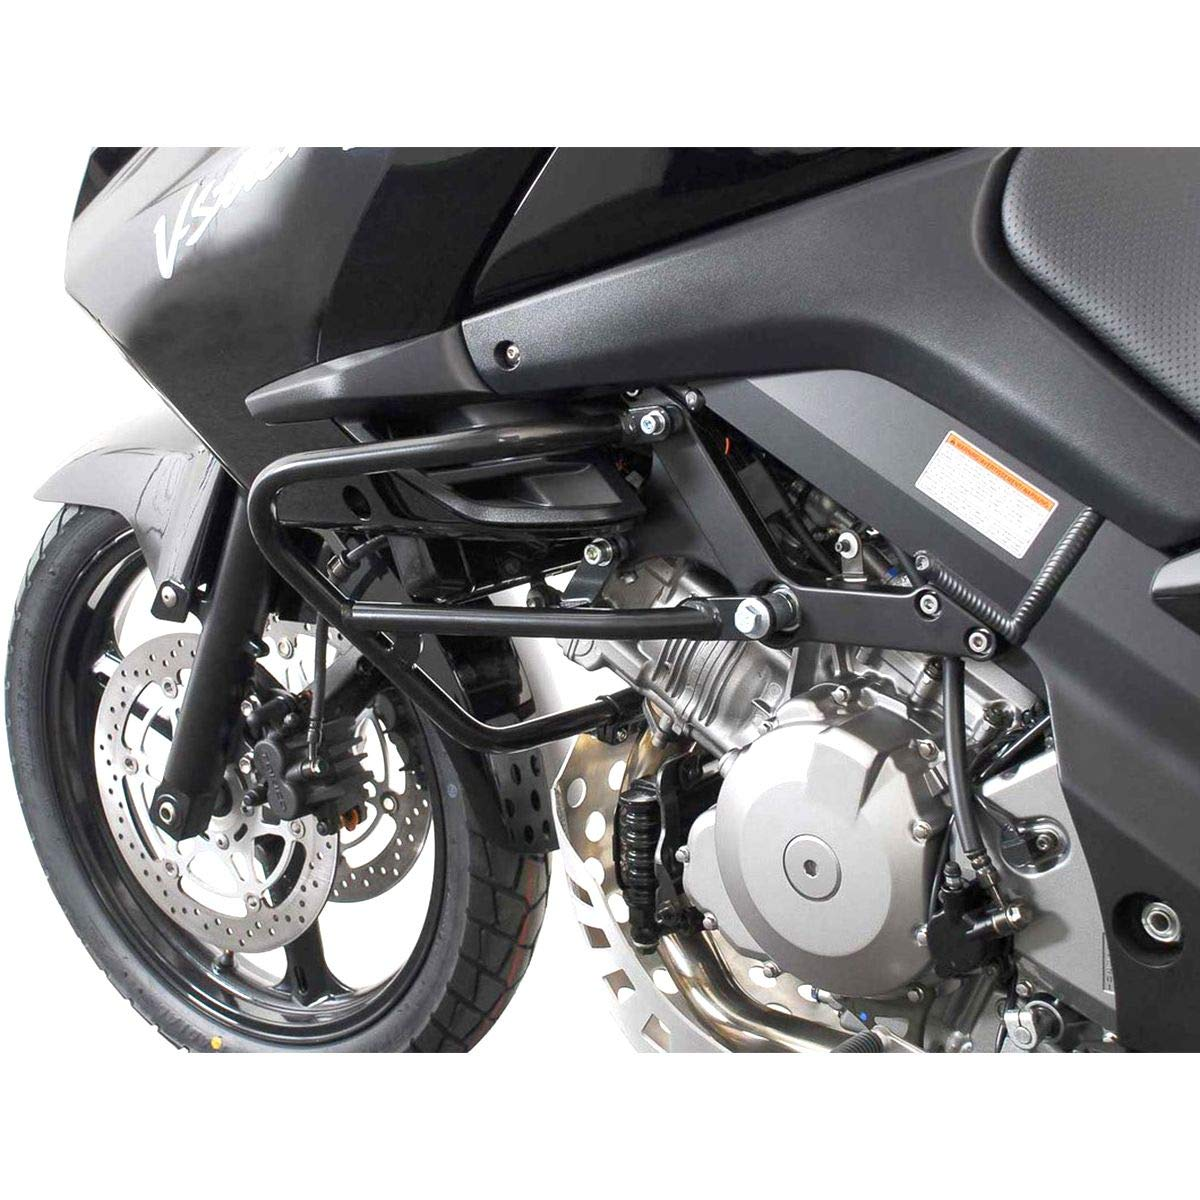 SW-MOTECH Crash Bars Engine Guards For Ducati Multistrada 950 17-18 Multistrada 1200 15-17 /& Multistrada 1260 18-19